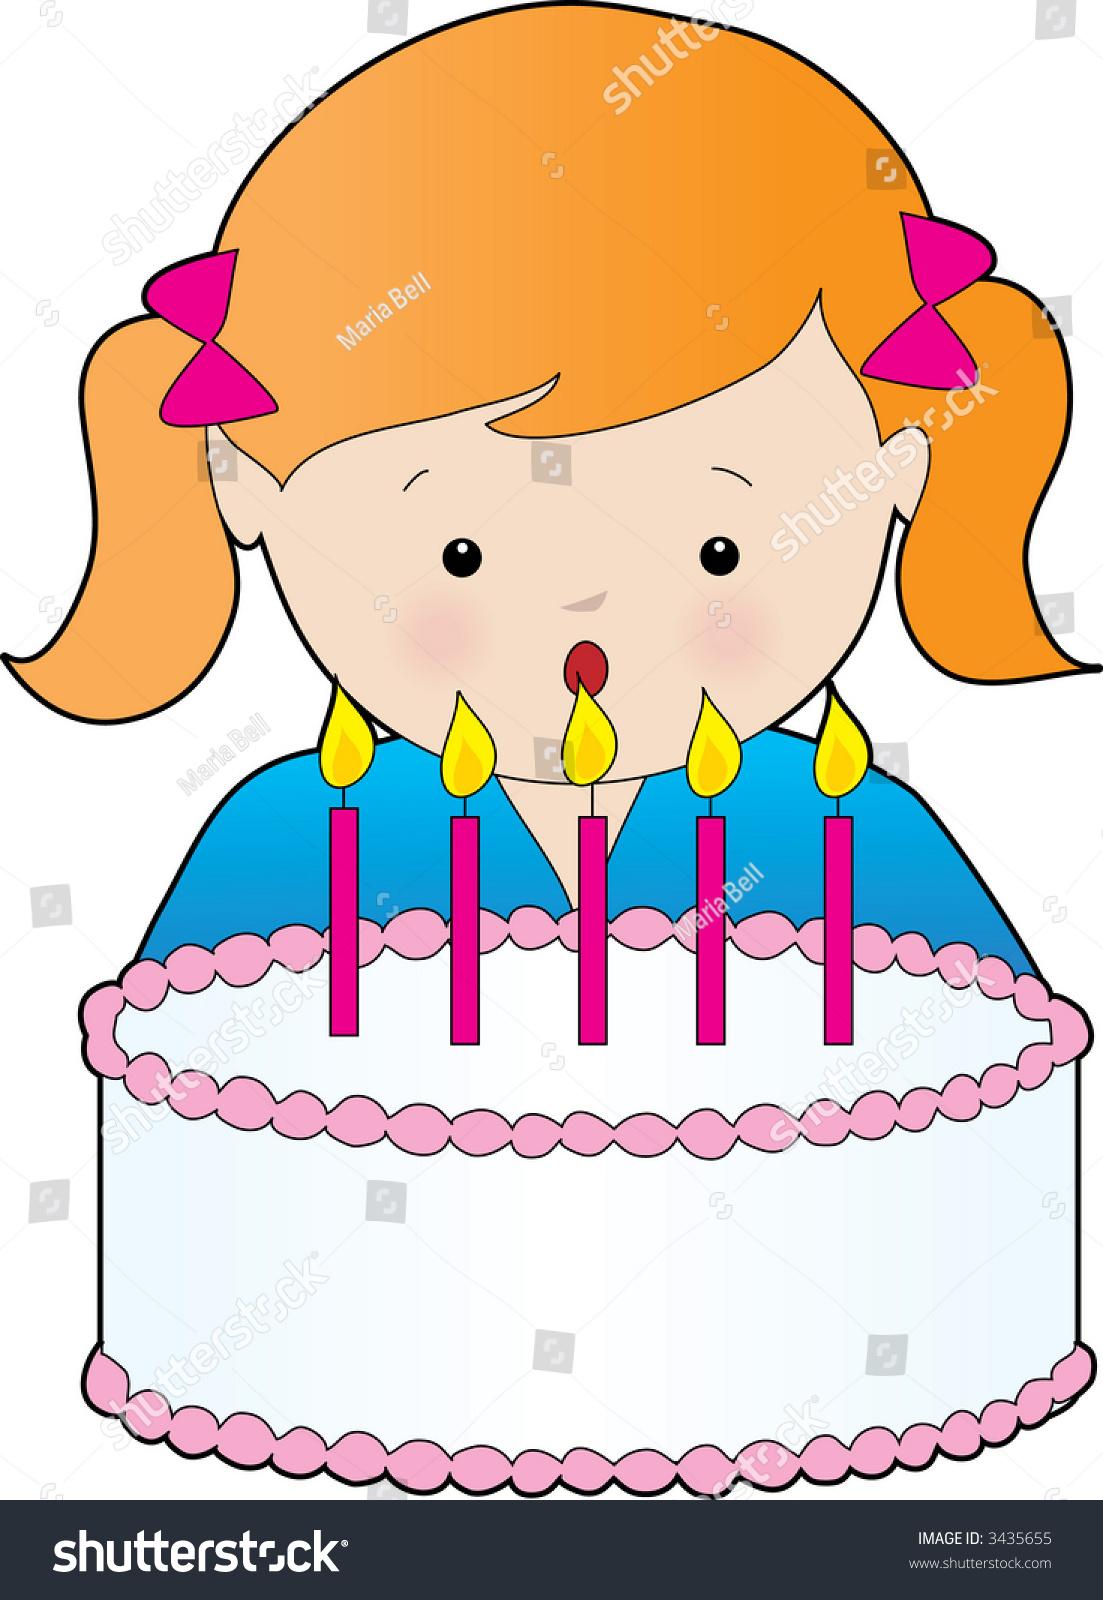 Залина с днем рождения картинки и открытки 23